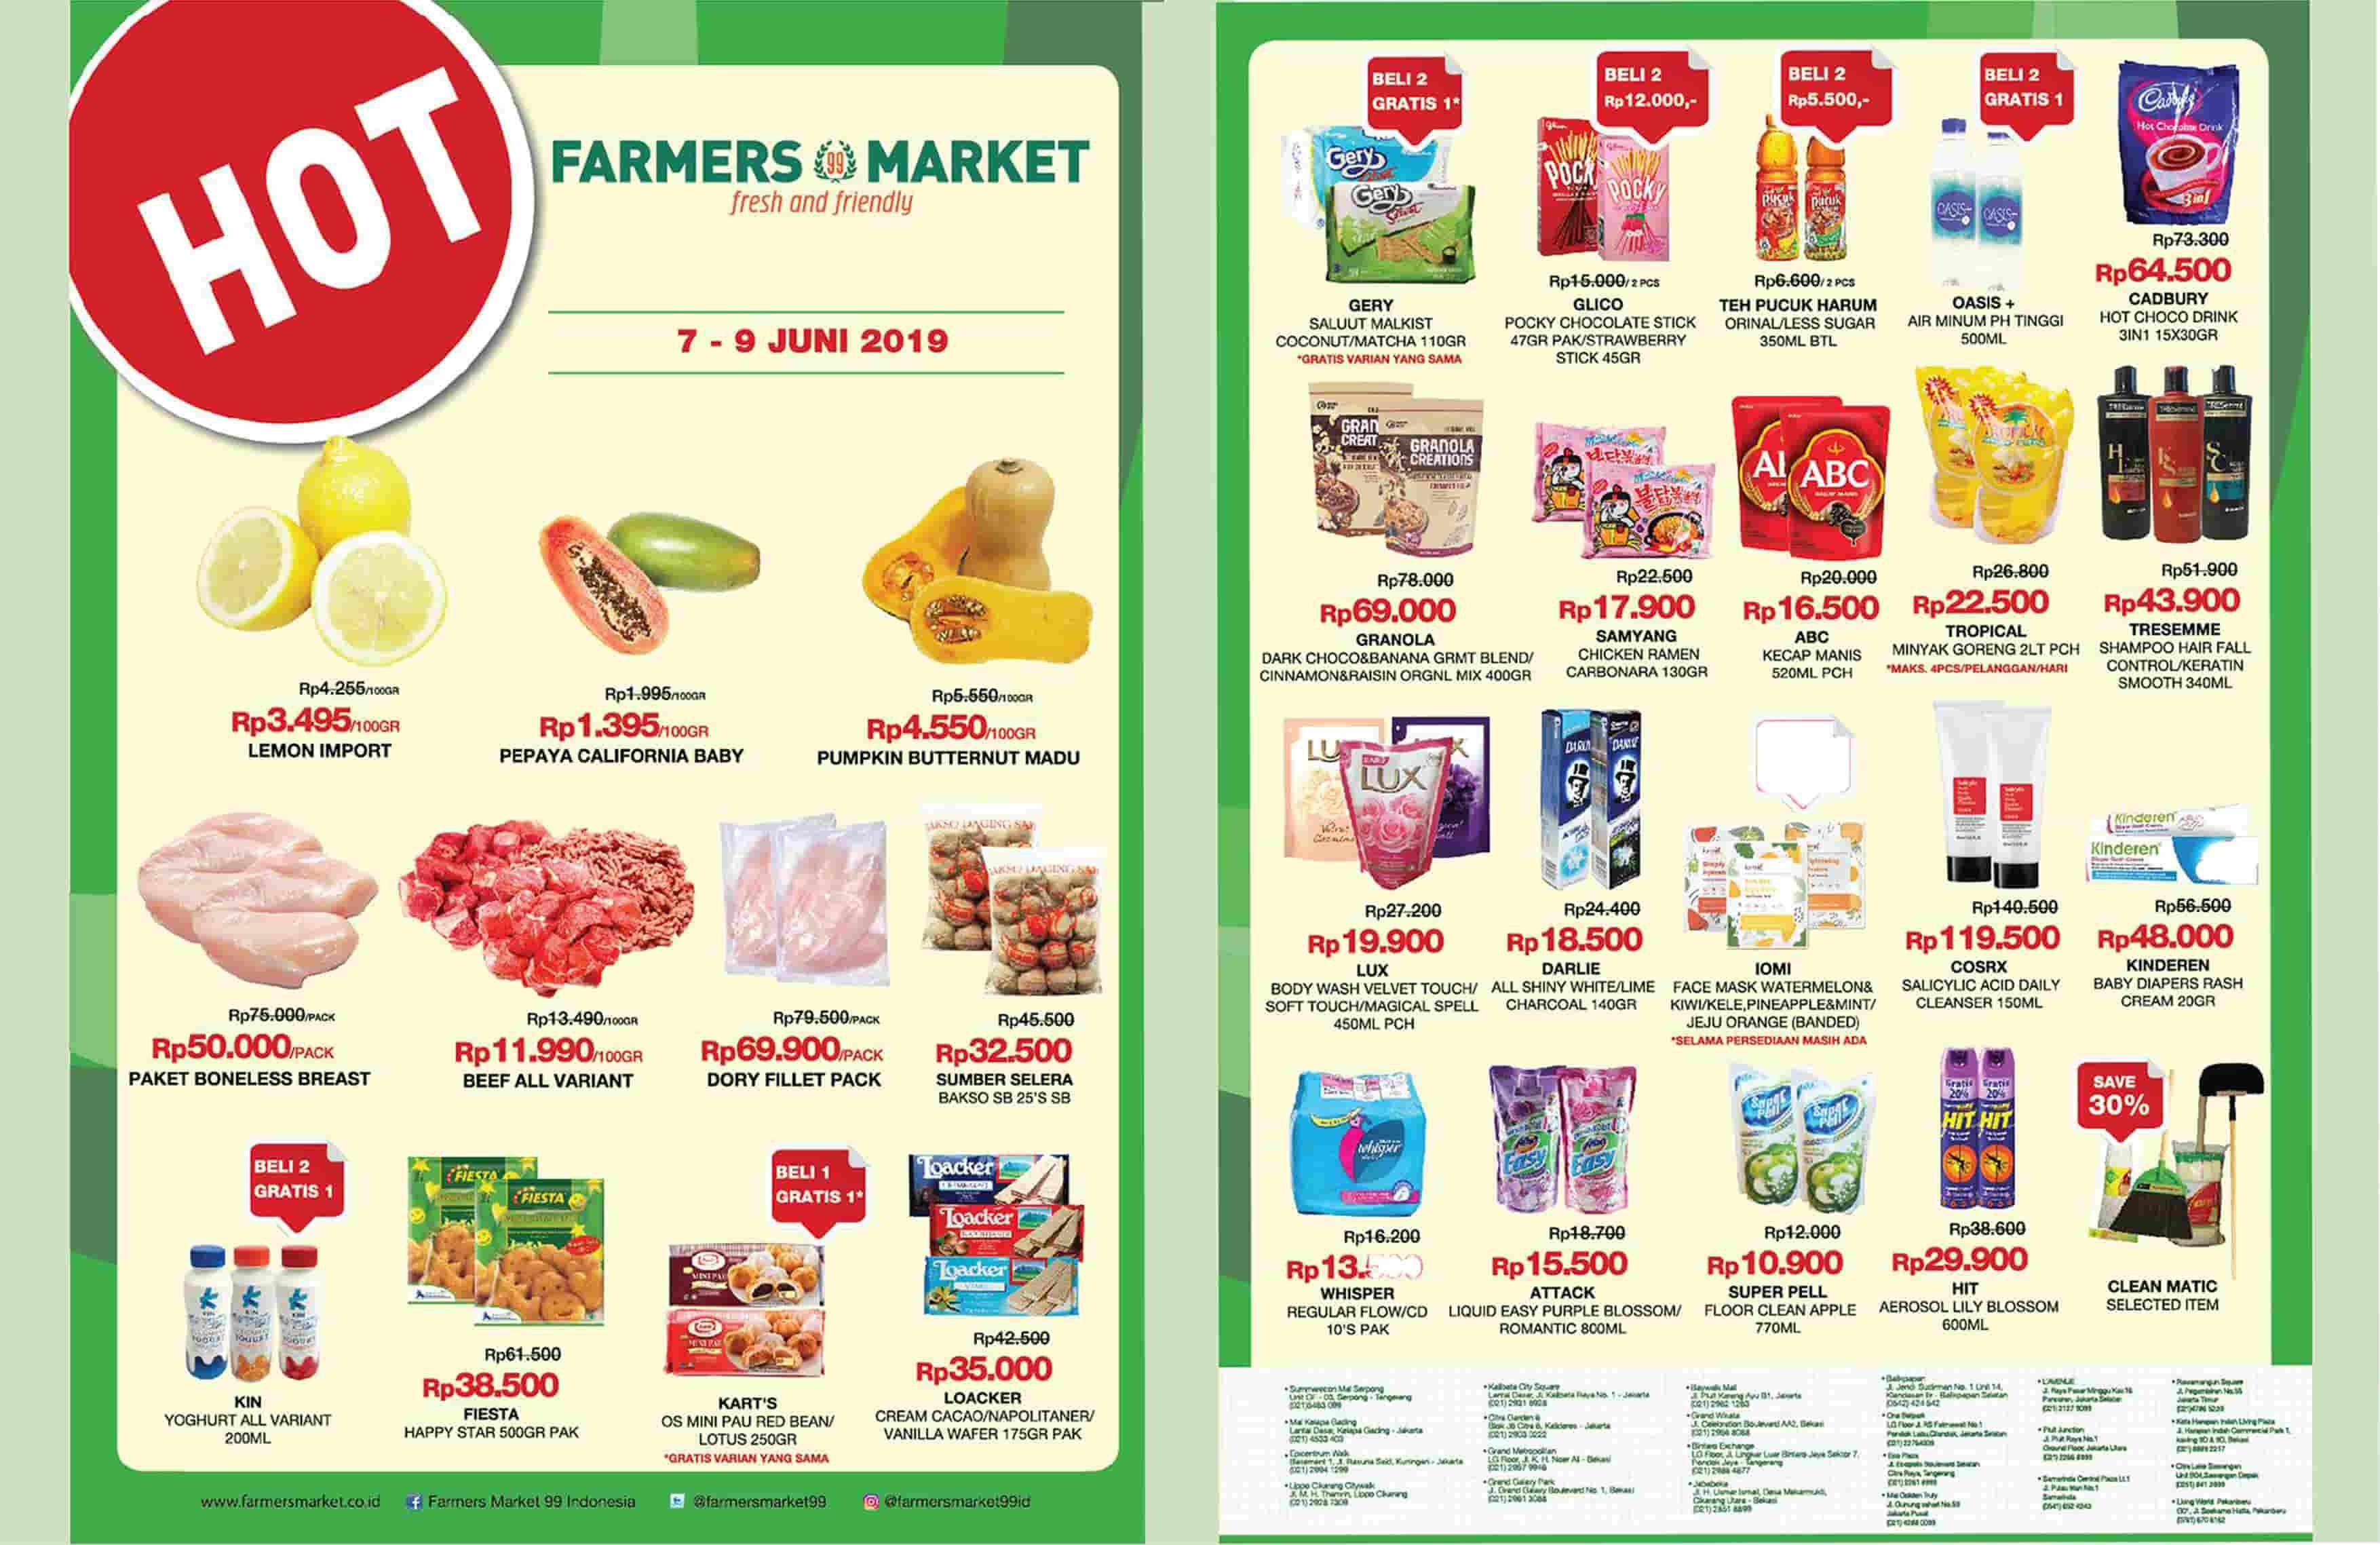 Katalog FARMERS MARKET Promo Weekend periode 07-09 Juni 2019